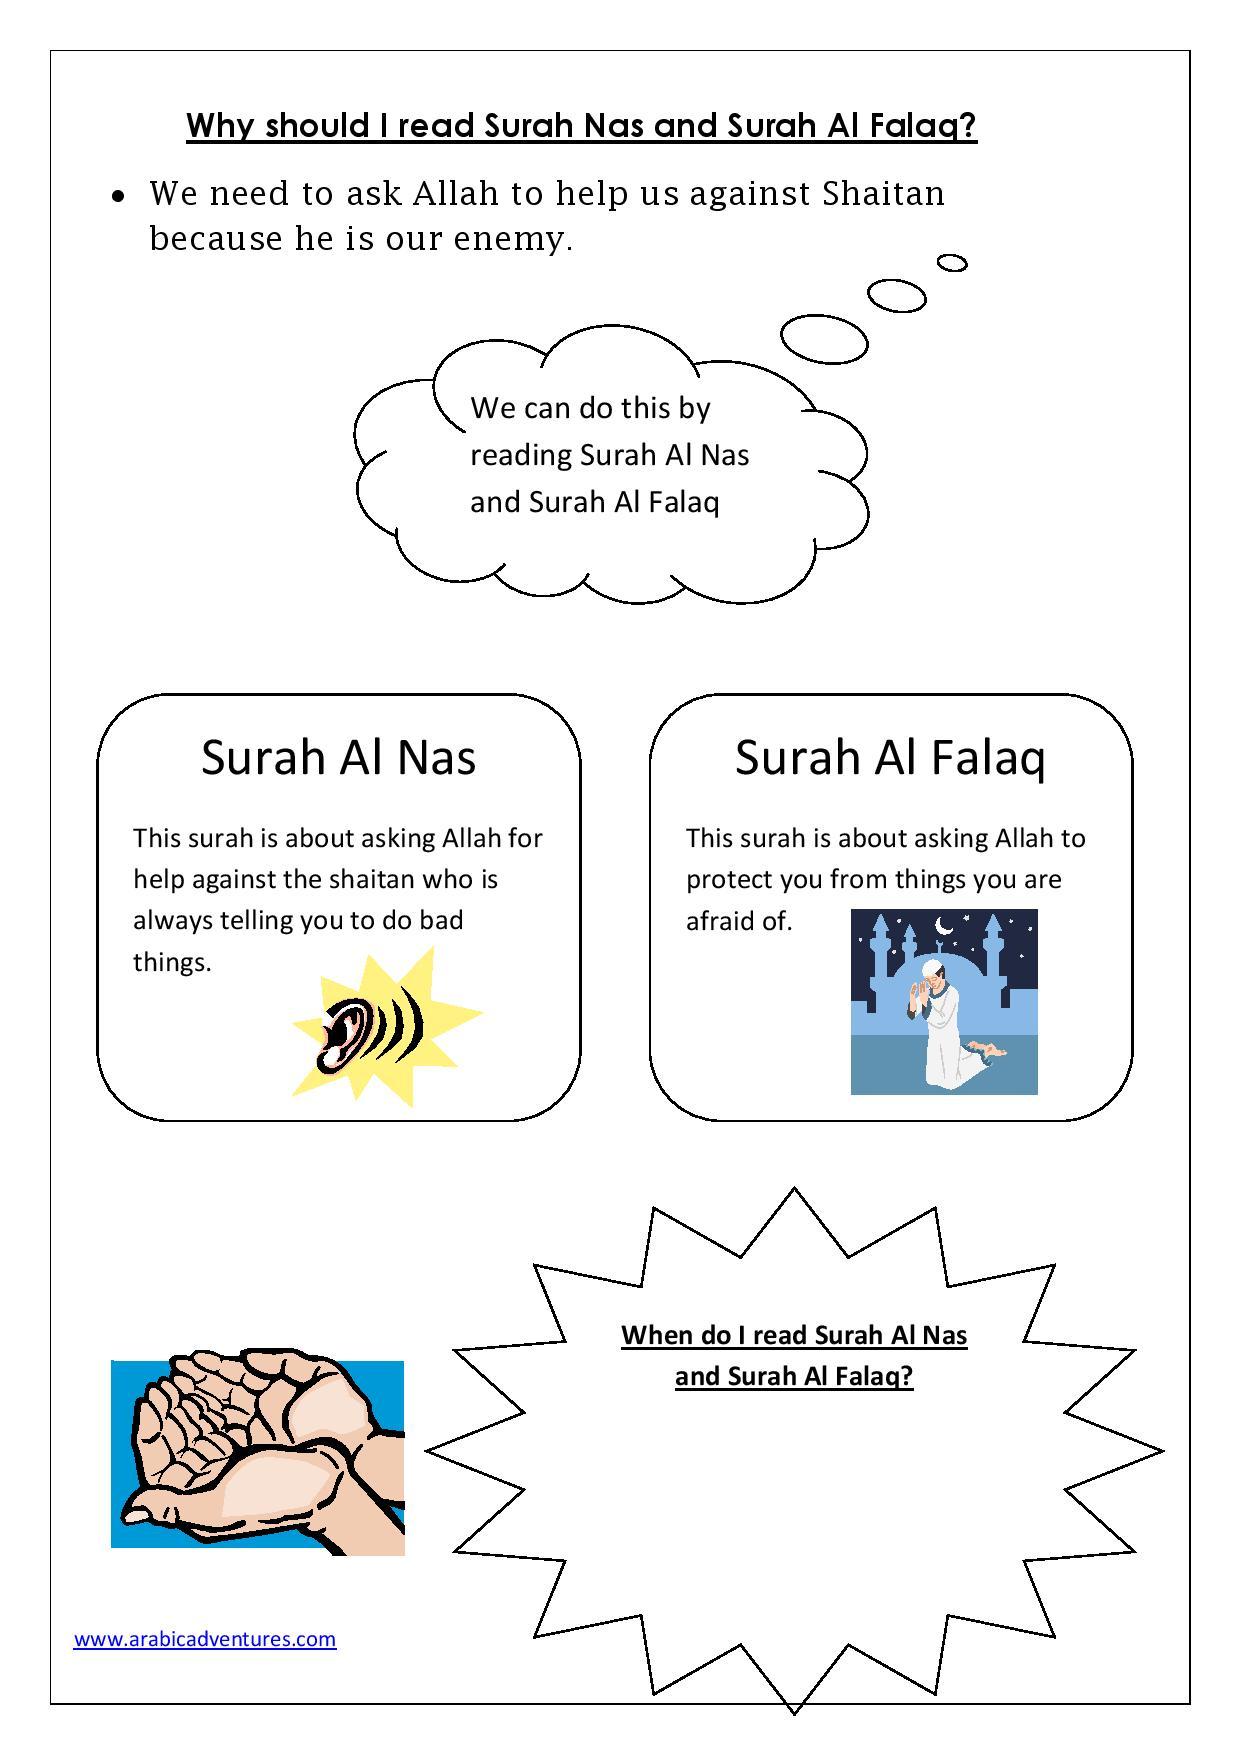 Early Years Surah Al Nas And Surah Al Falaq Activity